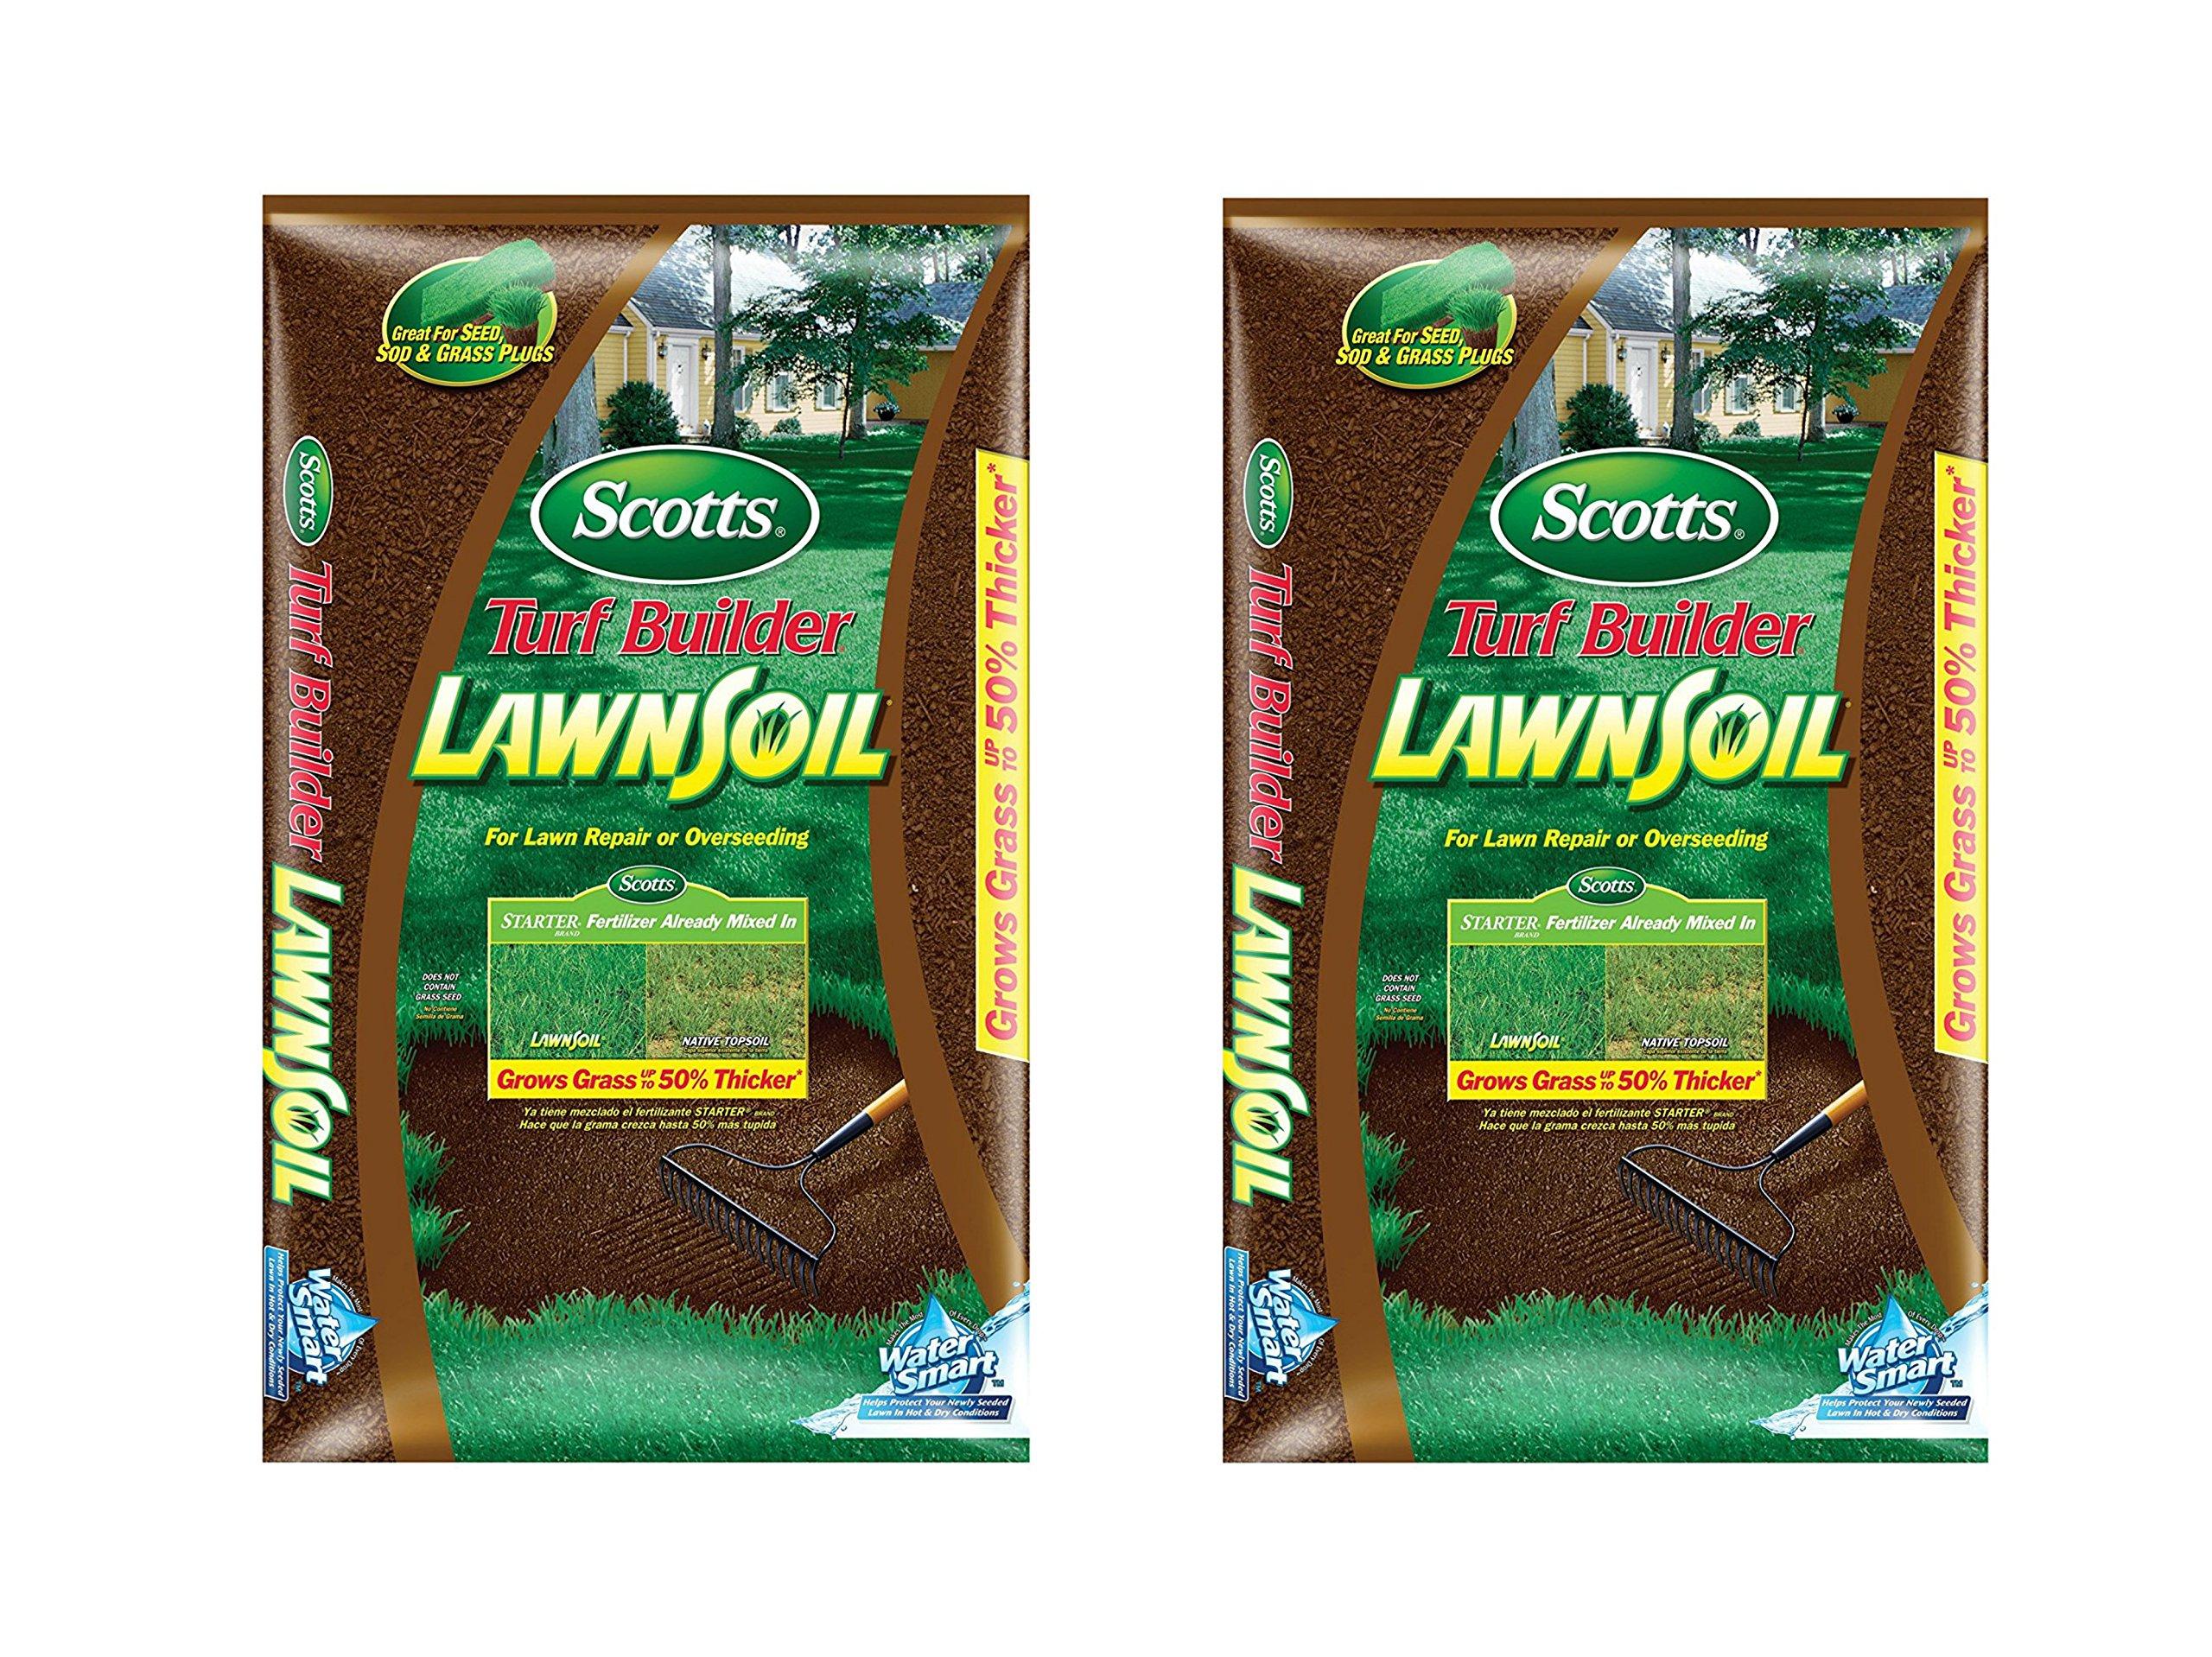 Scotts Turf Builder Lawn Soil, 1. 0-Cubic Foot (2) by Scotts